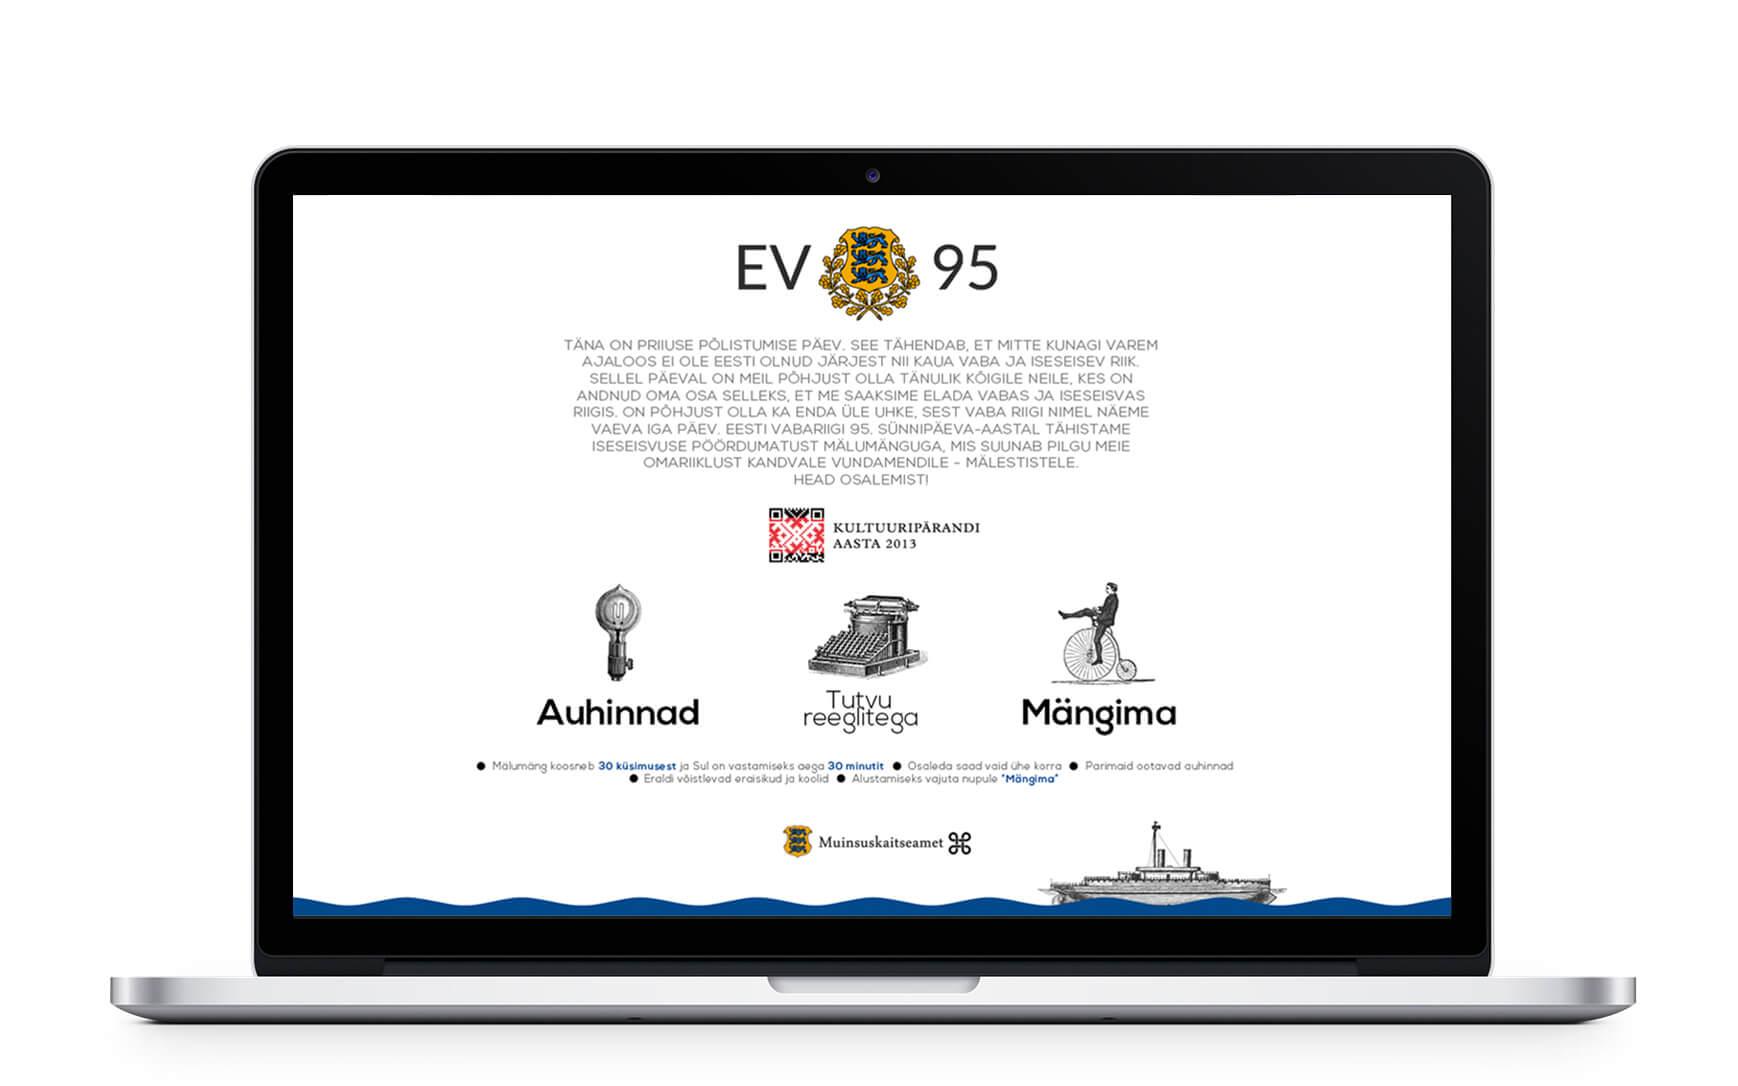 ev95-malumang-main